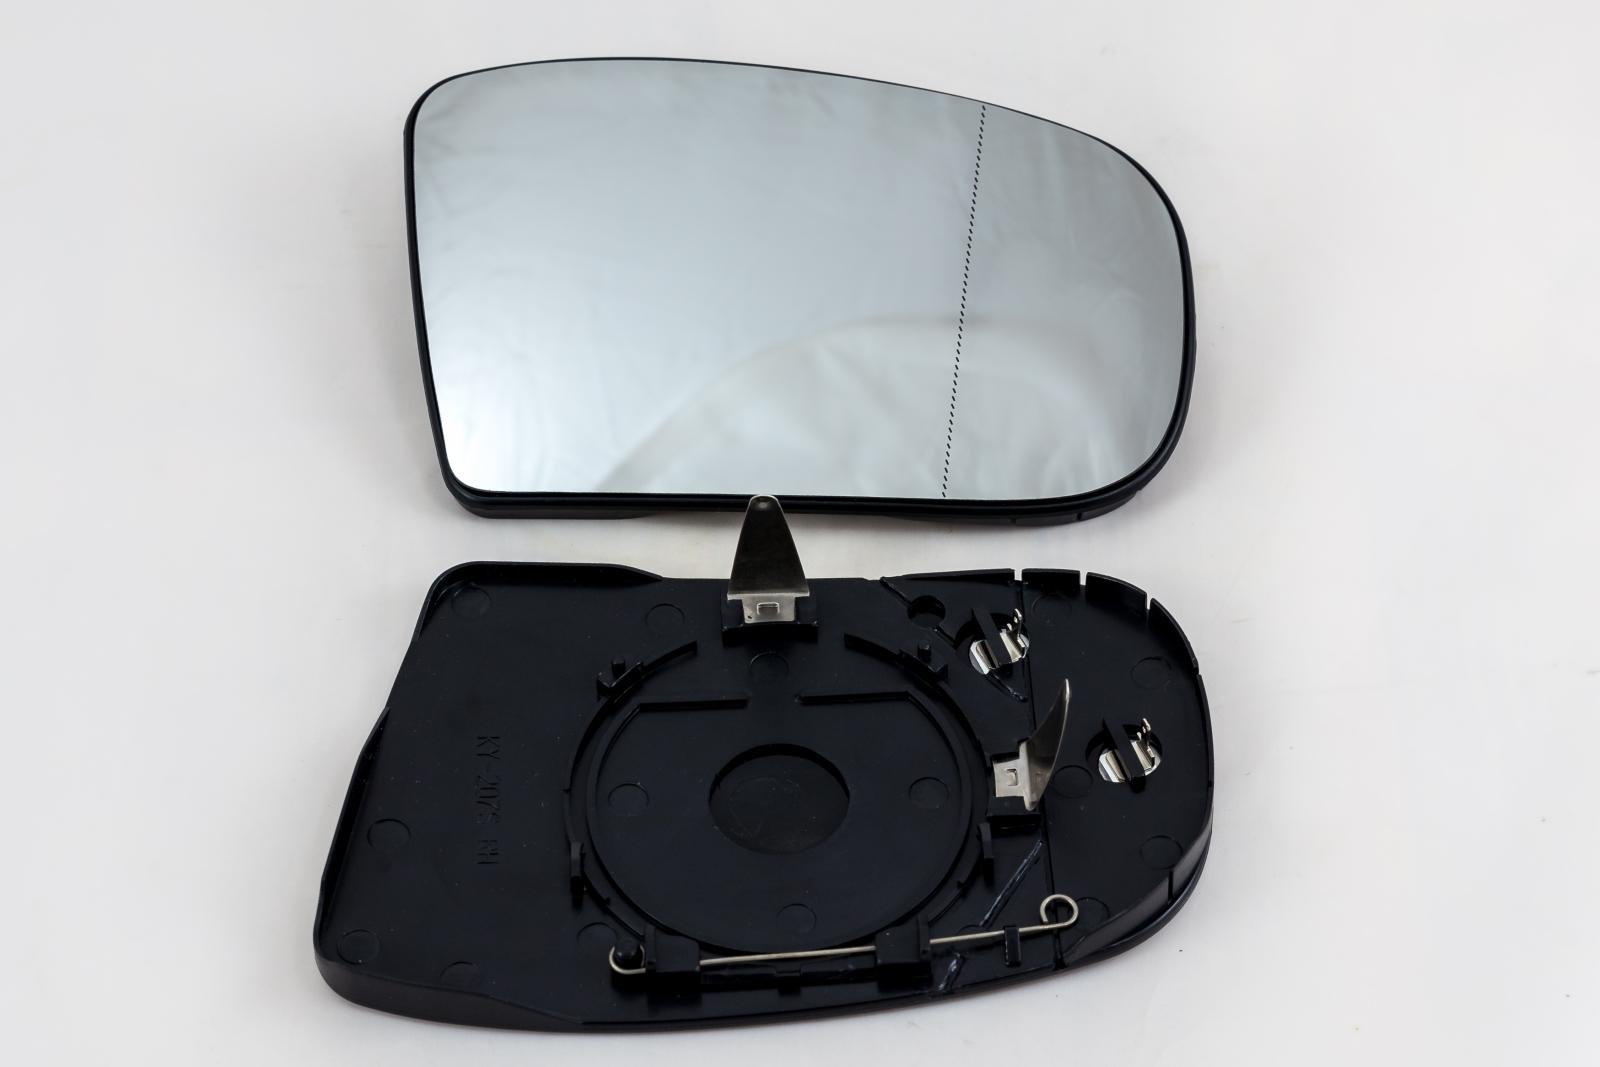 aussenspiegel geh use spiegel kappe abdeckung rechts f r. Black Bedroom Furniture Sets. Home Design Ideas